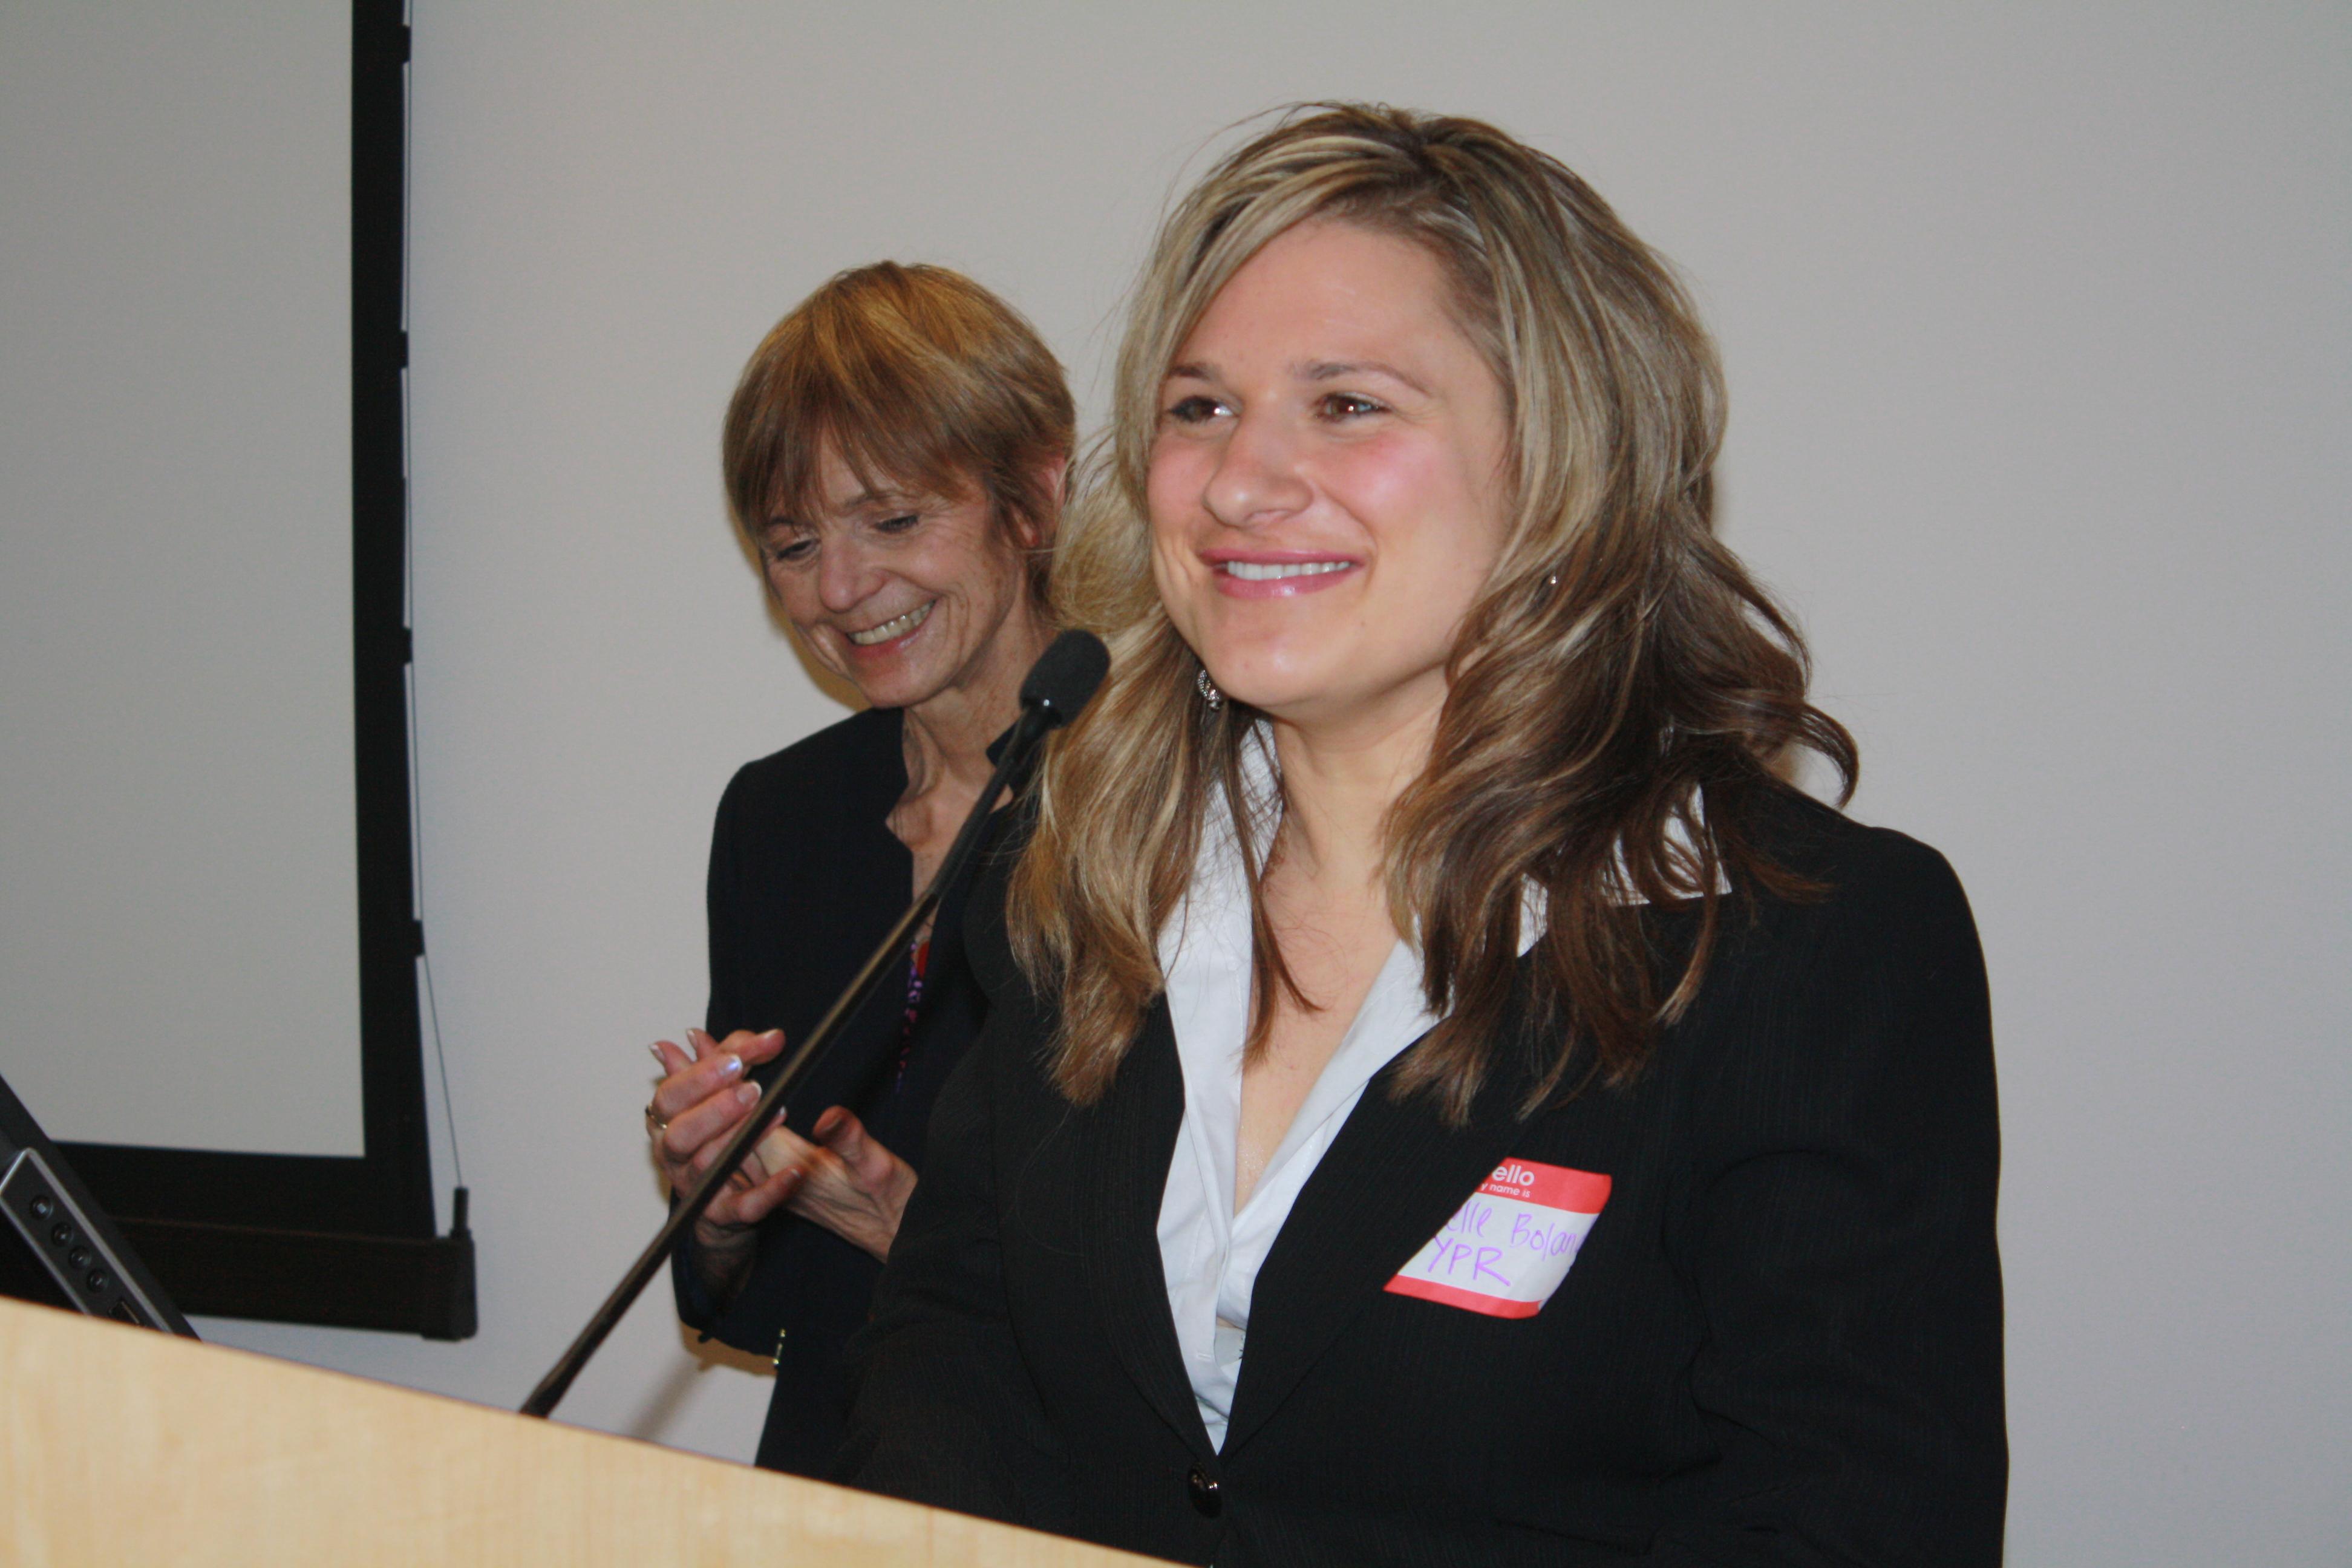 Danielle Boland of YPR